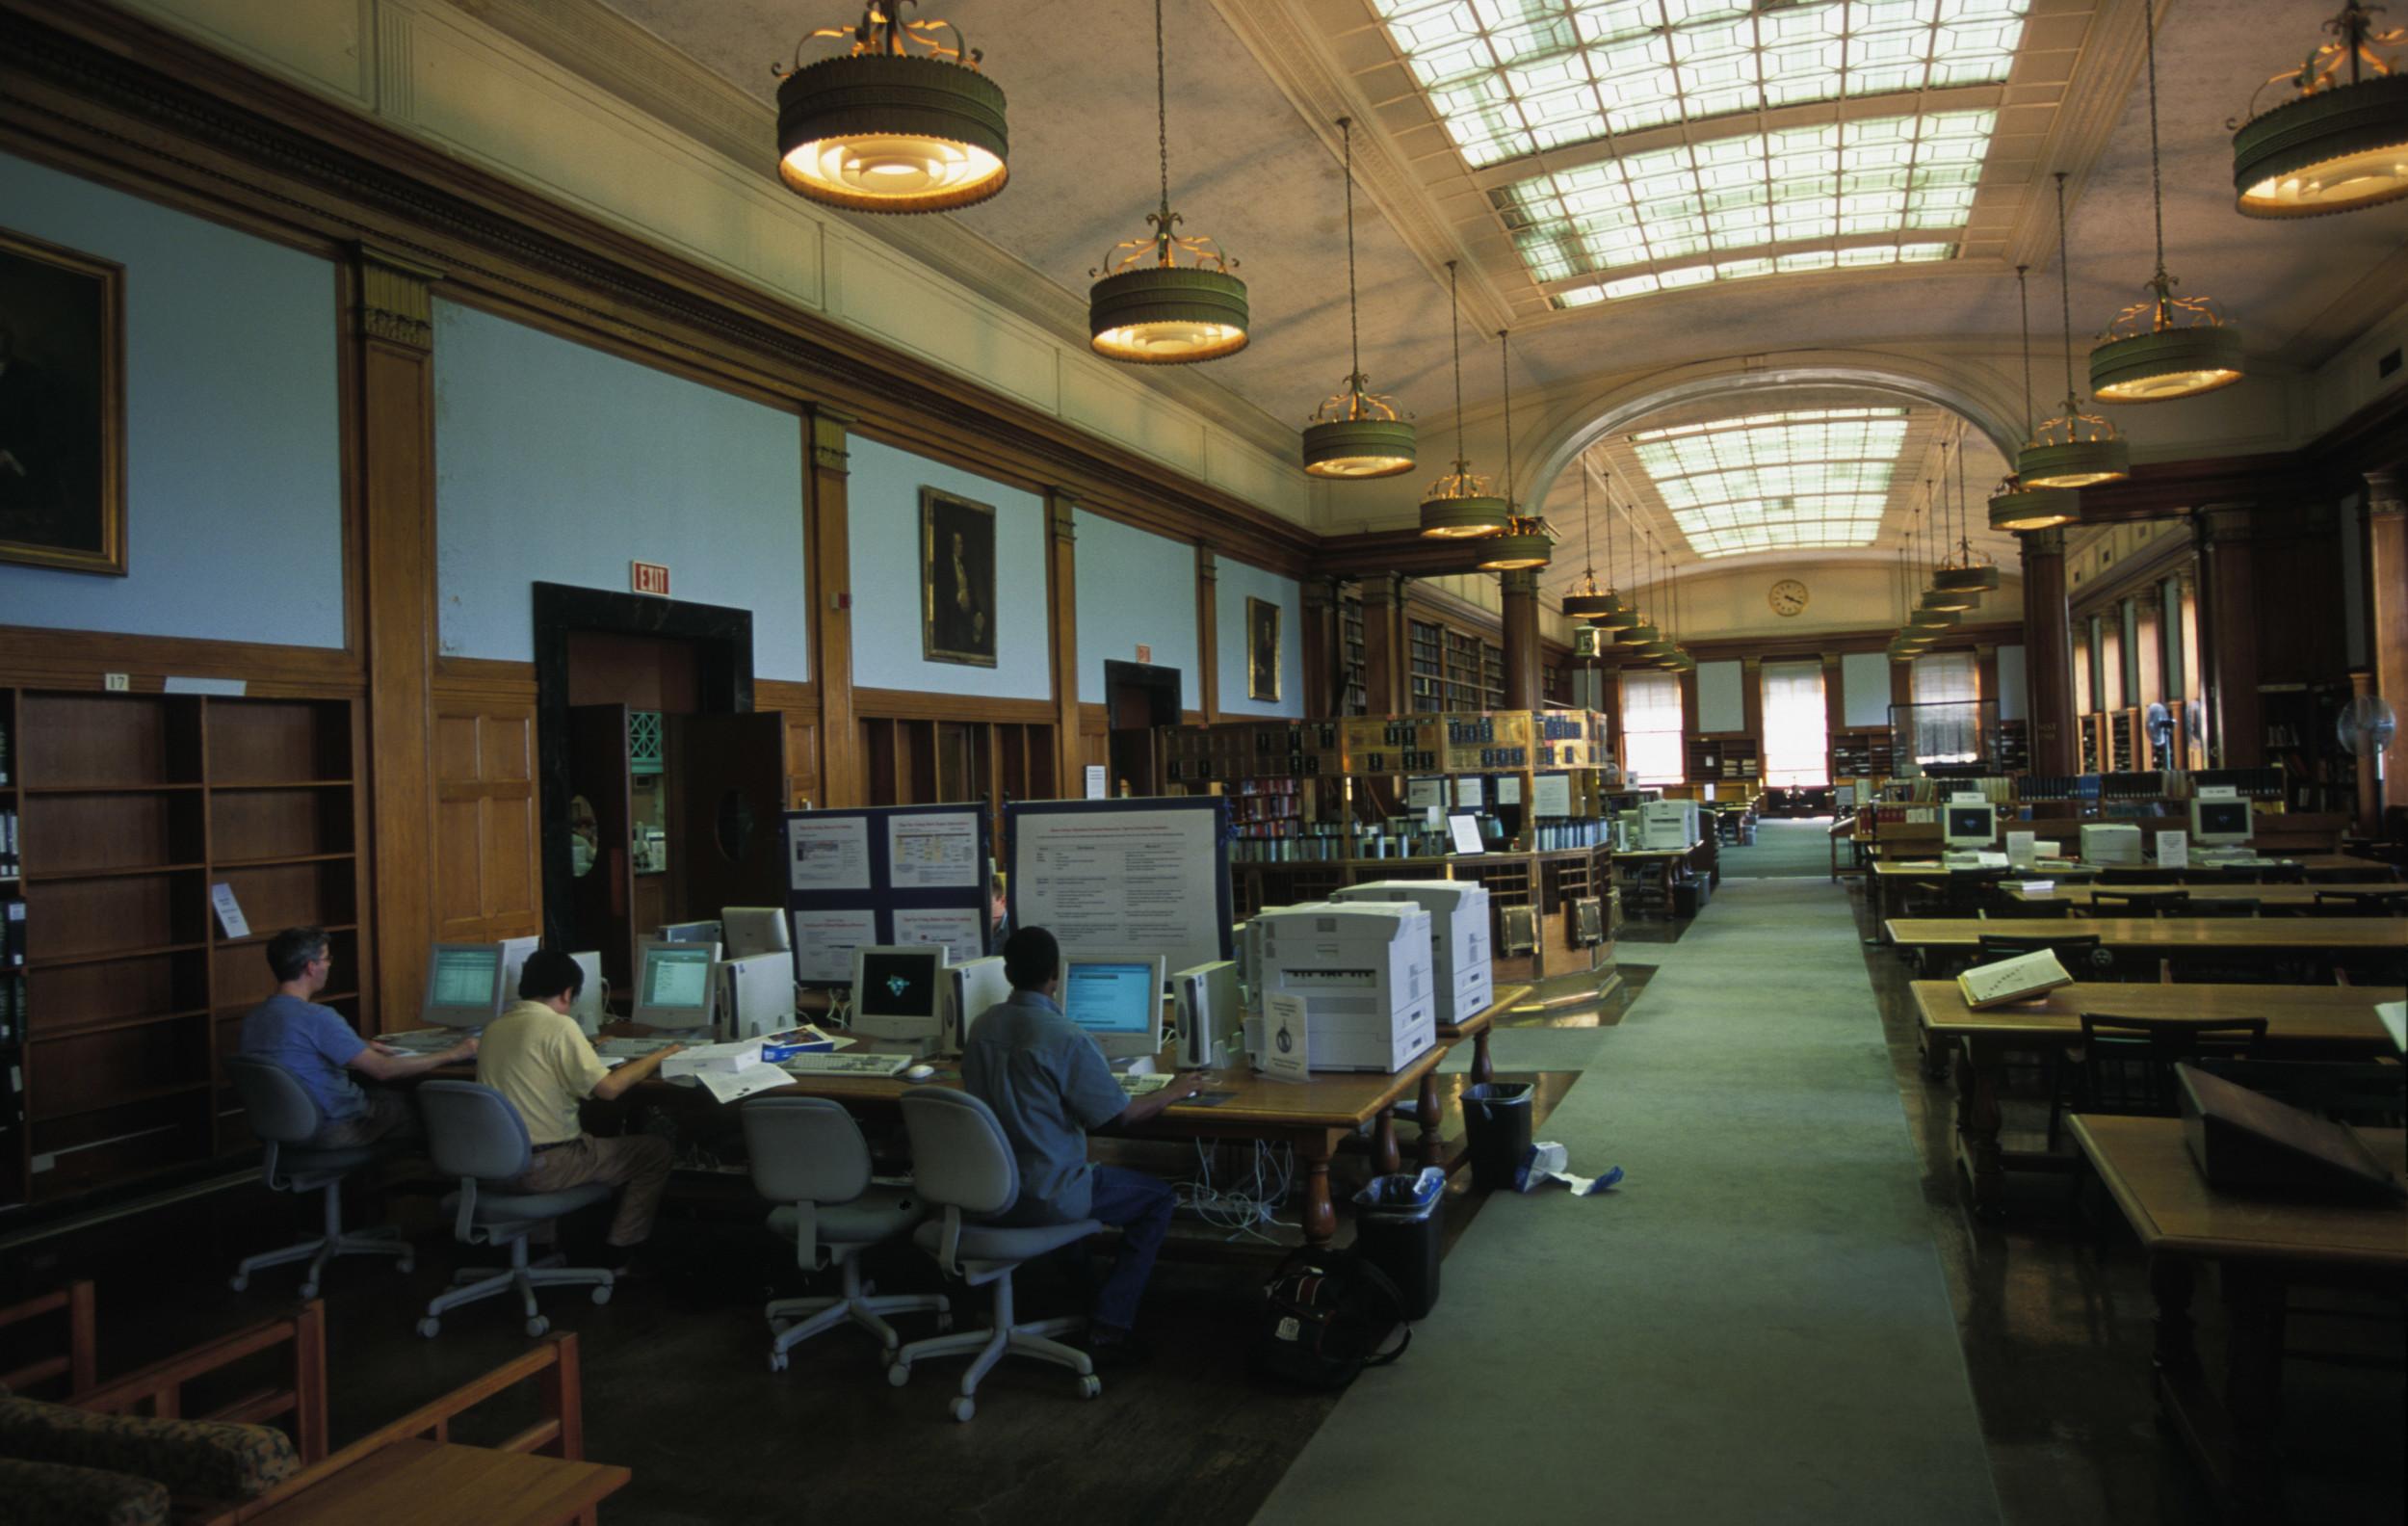 Students work inside Baker Library at Harvard